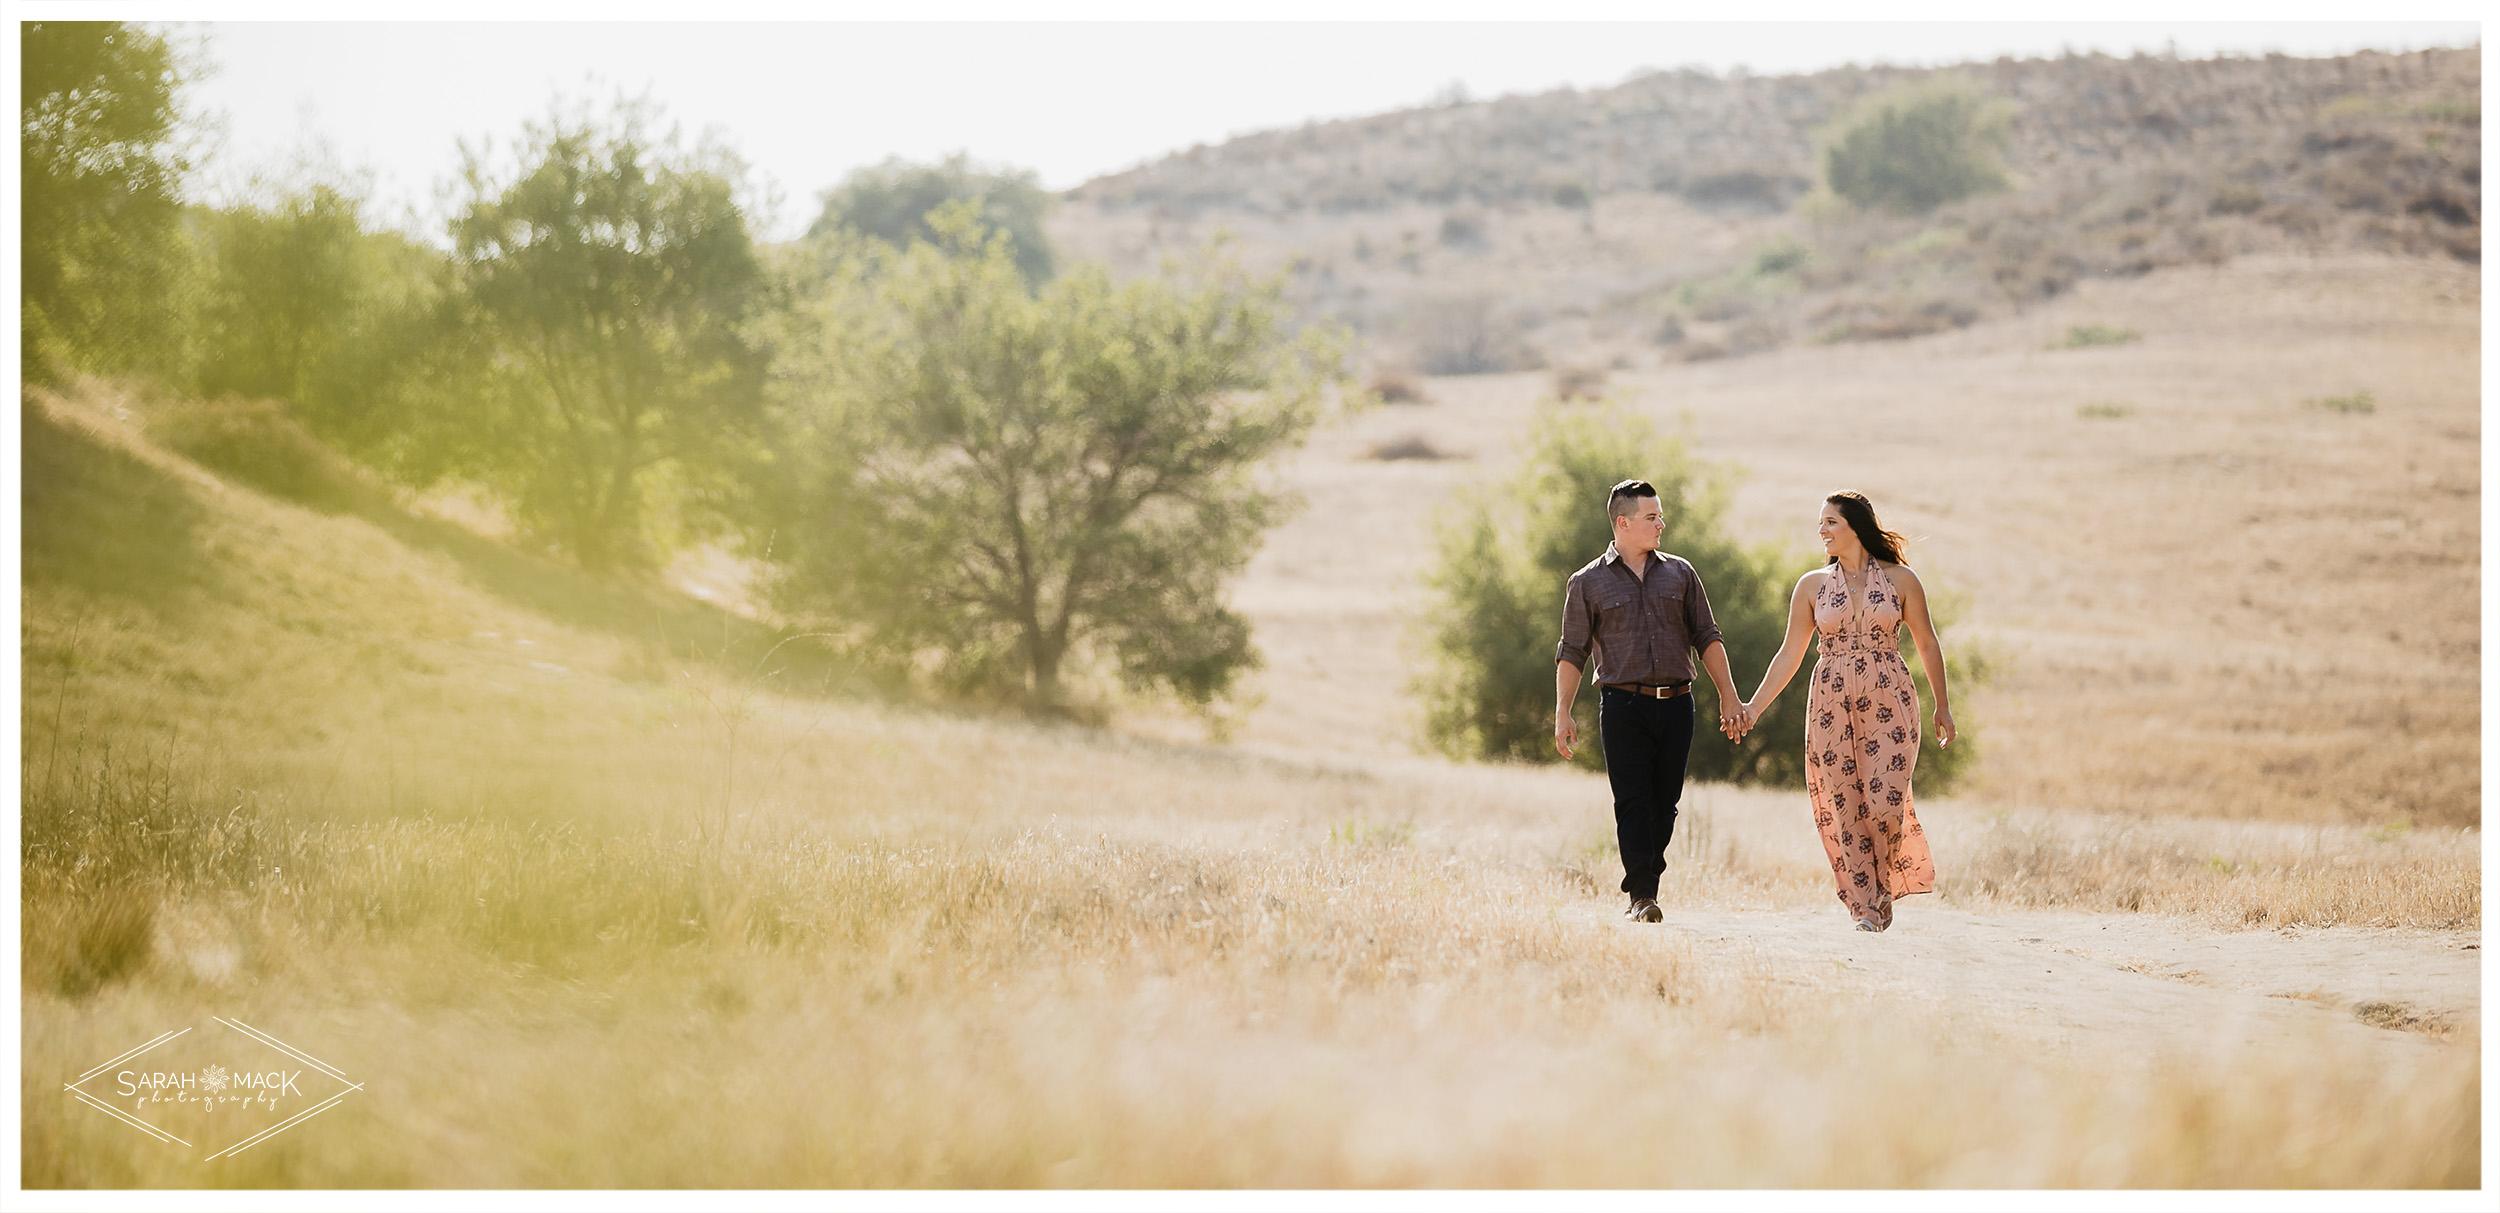 TM-Laguna-Beach-Orange-County-Engagement-Photography-7.jpg